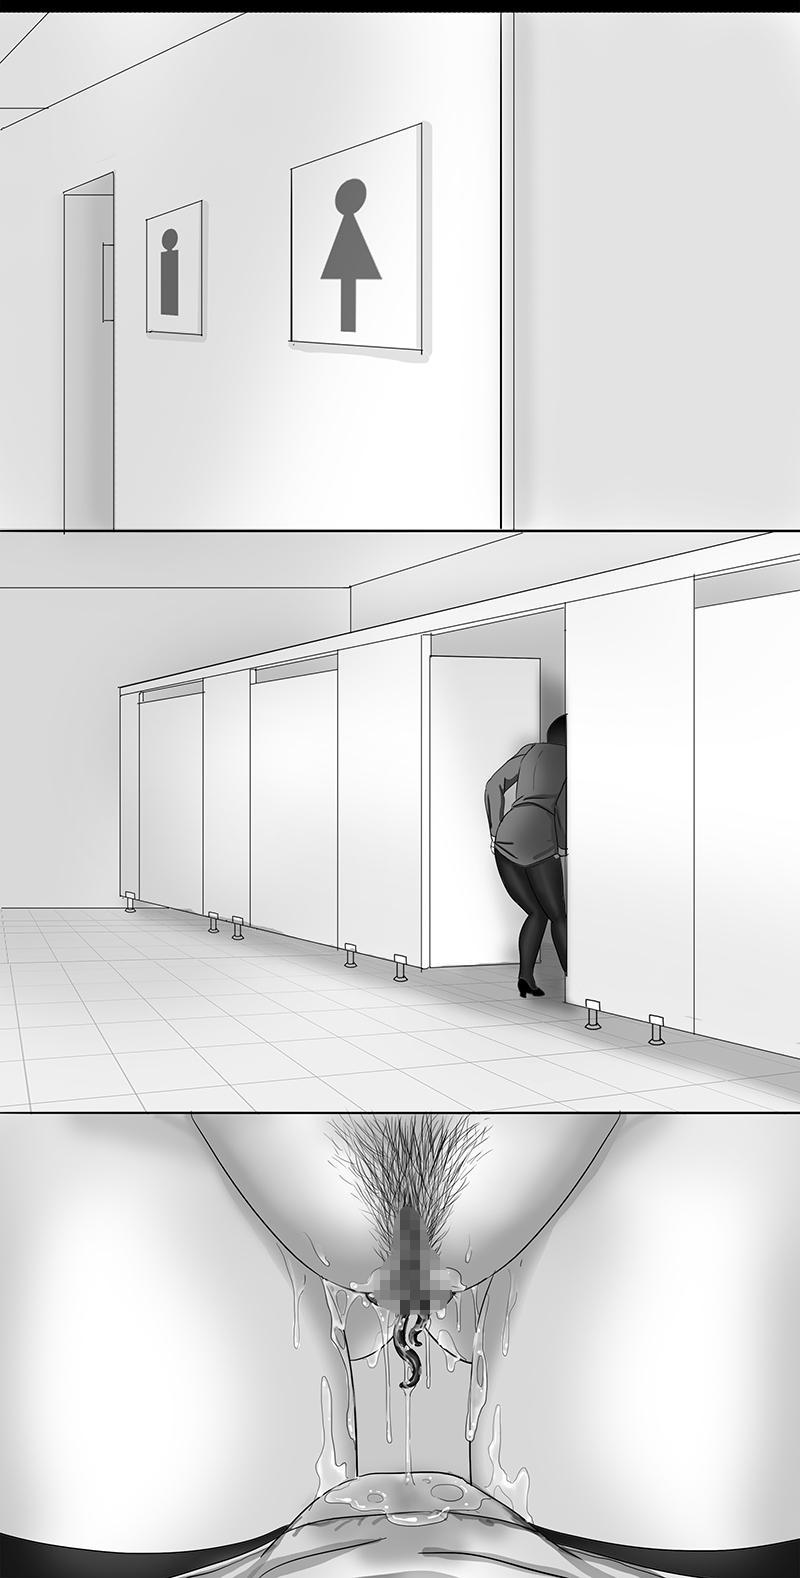 [skyzen] 寄生虫系列 [English] [xinsu] pg. 1-48 35